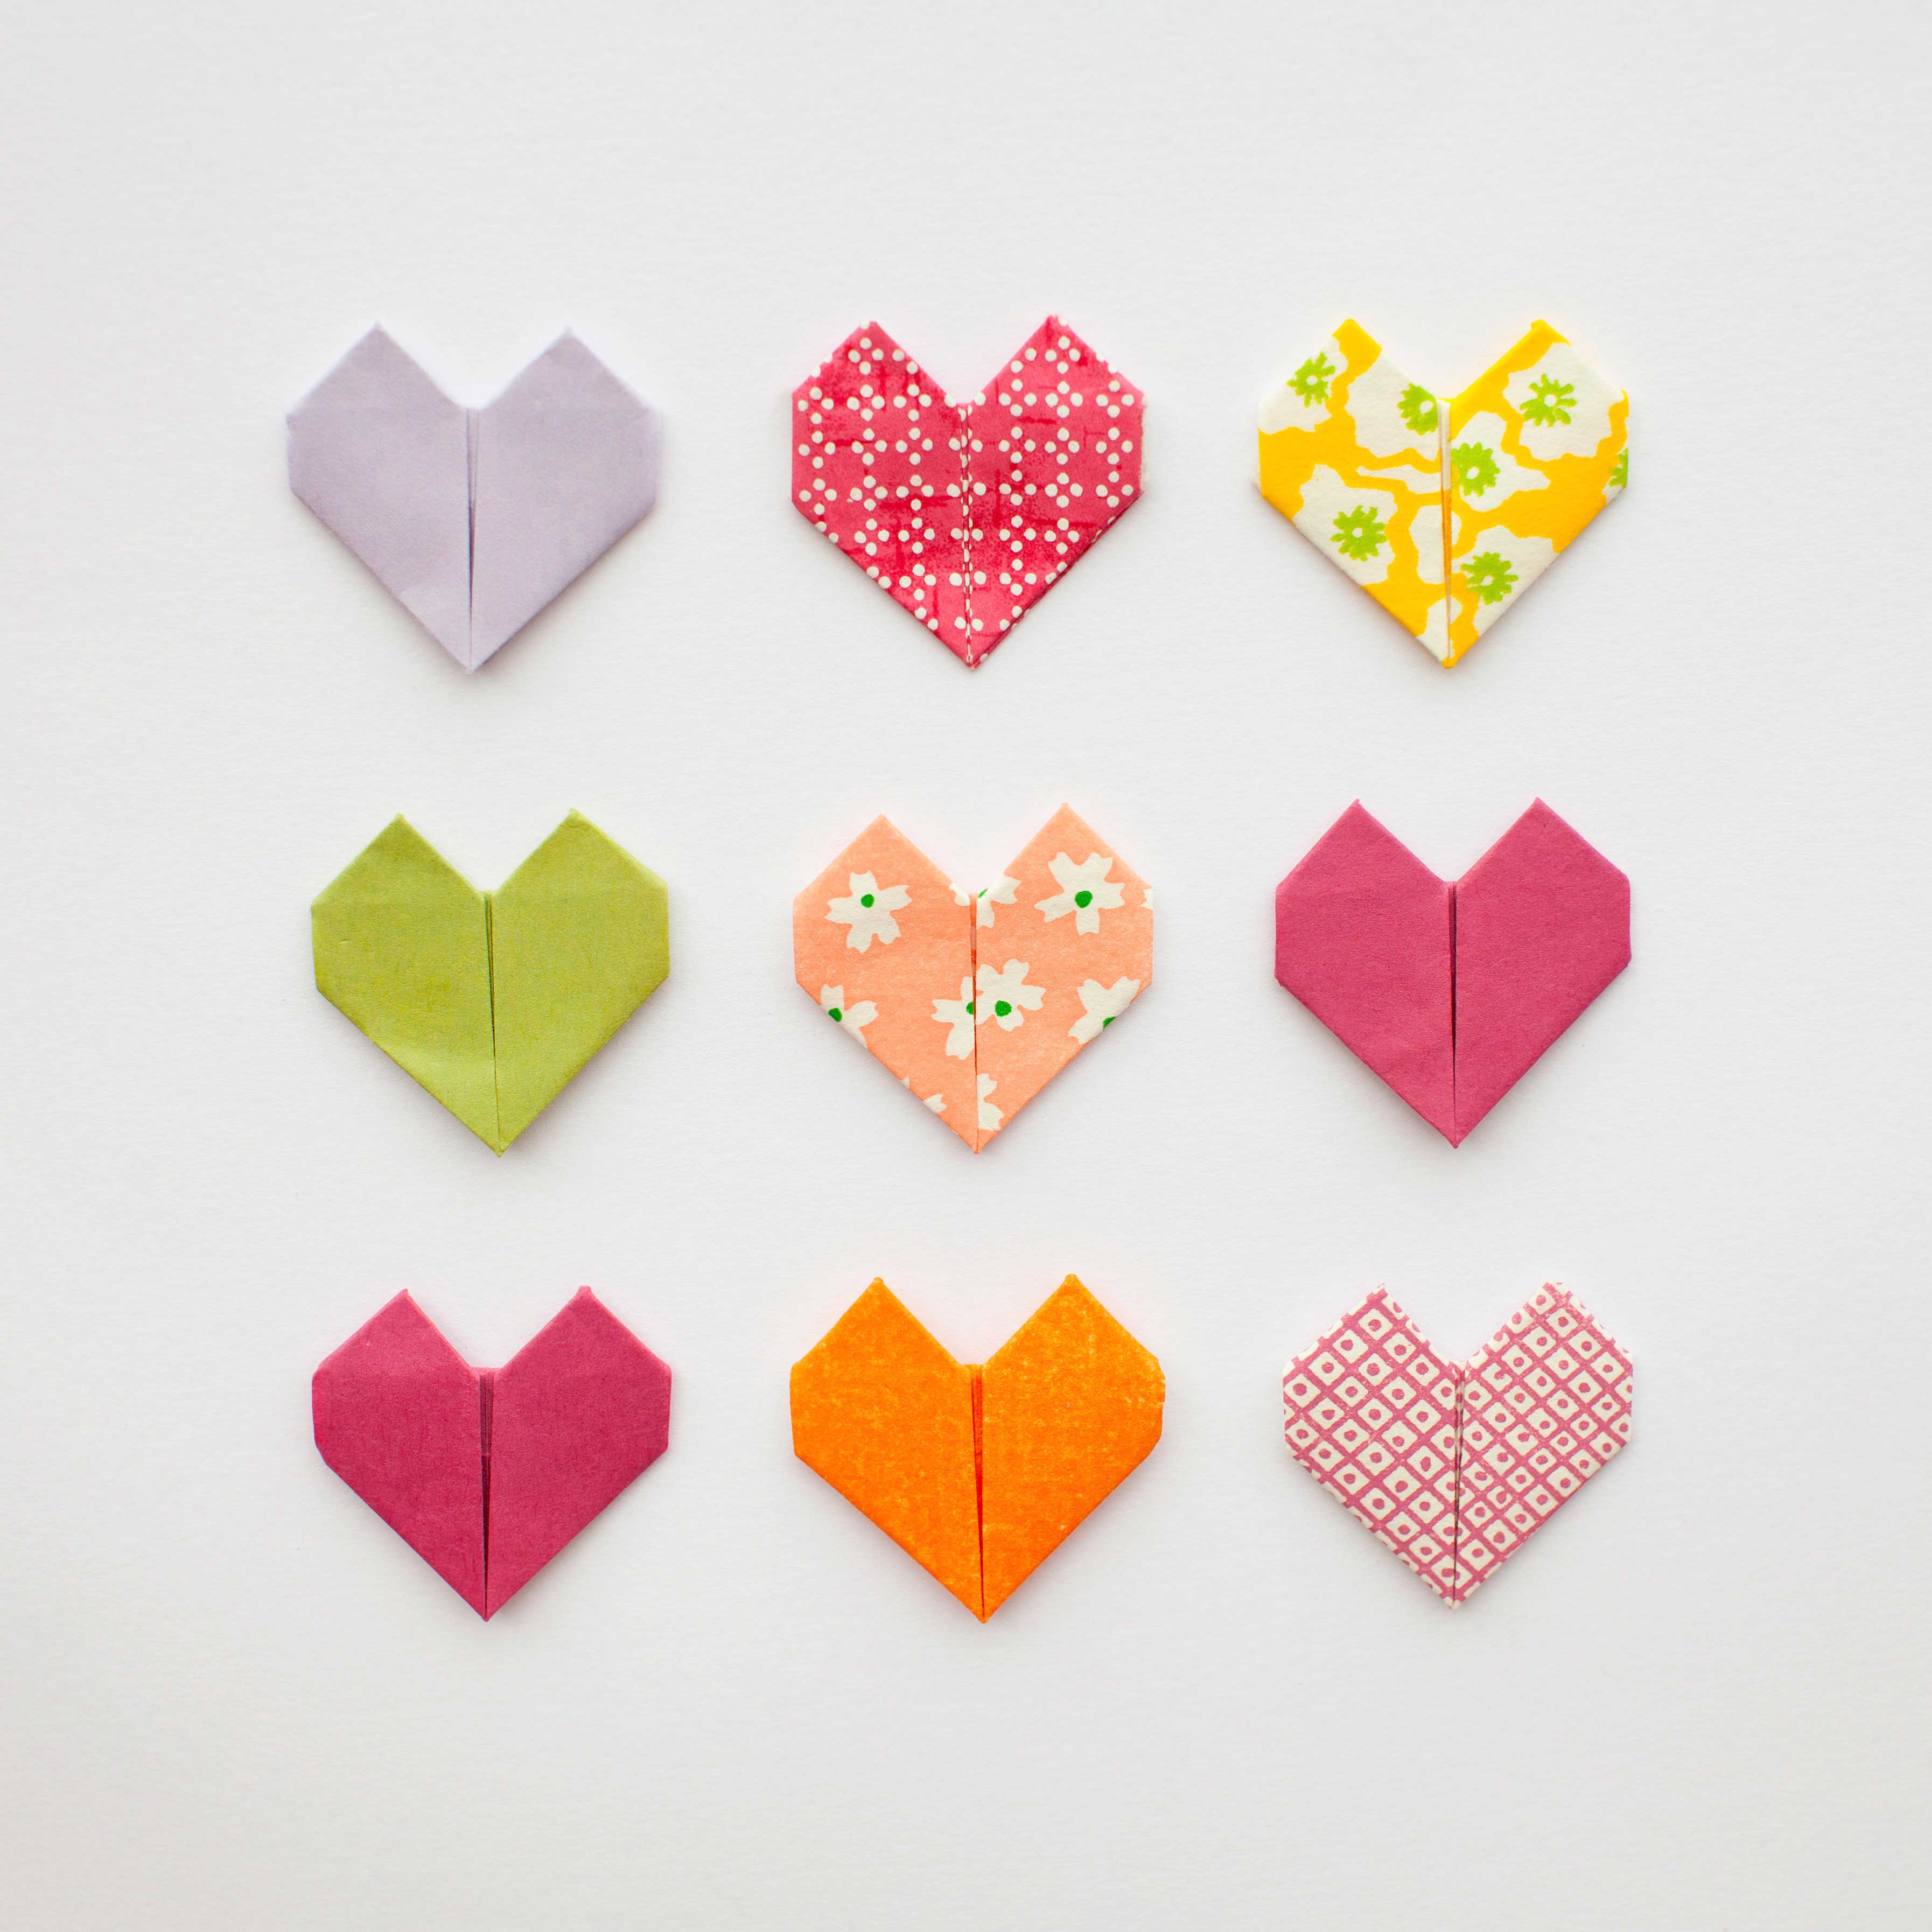 20 diy valentine's day cards ️  living mi vida loca